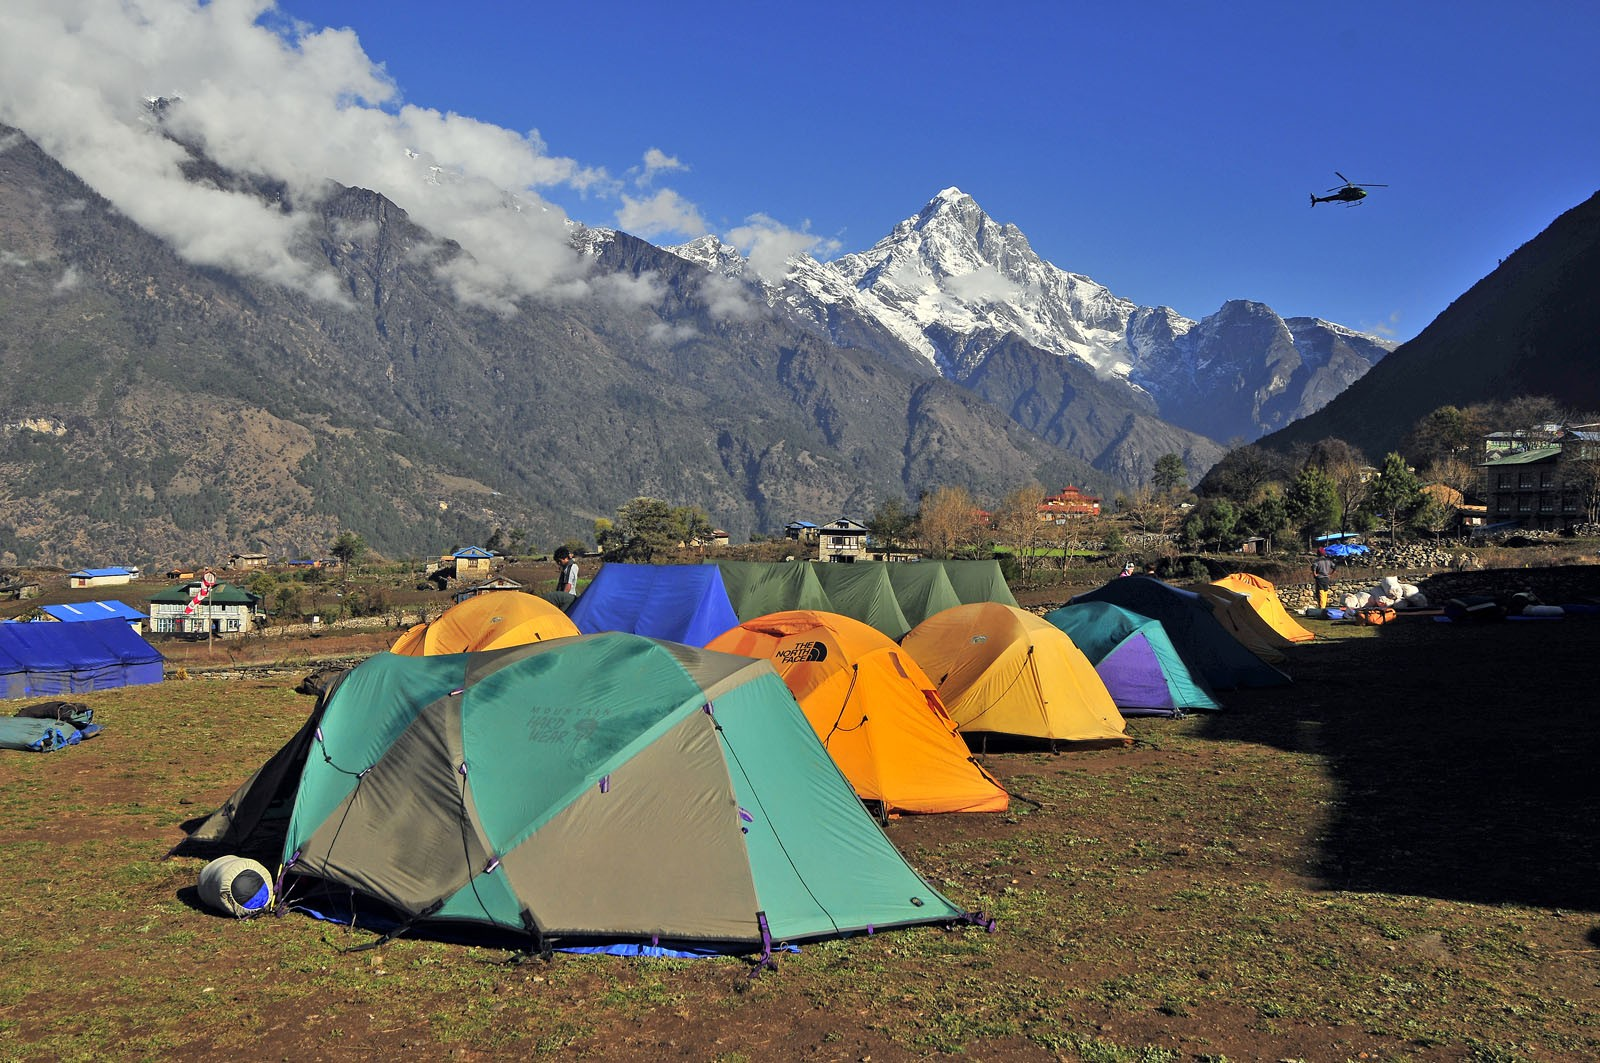 Camping trek in Nepal, Nepal Camping Trekking